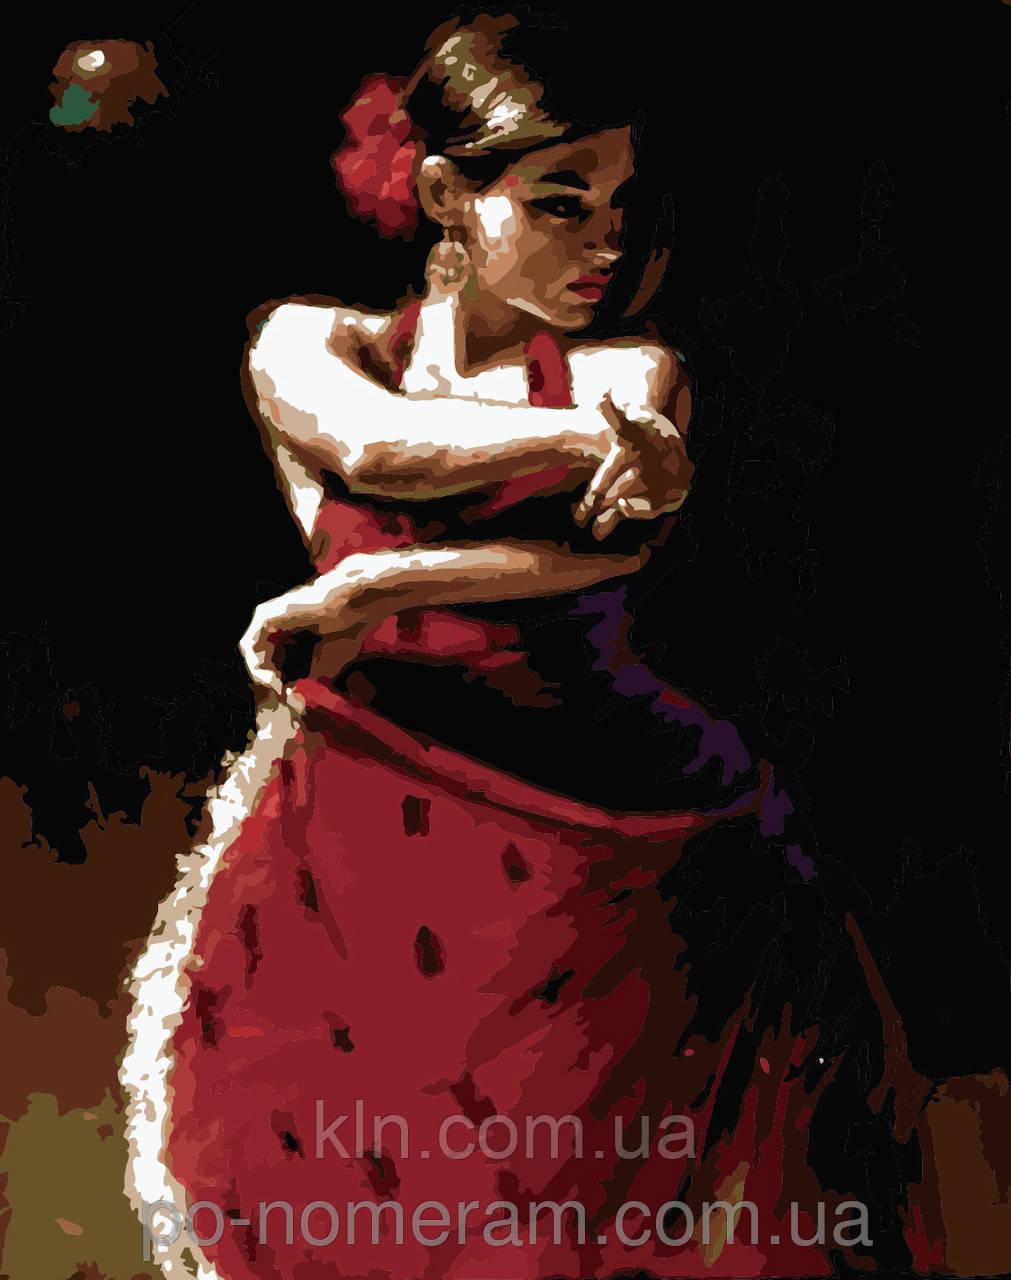 Картина по номерам Menglei Танец жизни MG1006 40 х 50 см